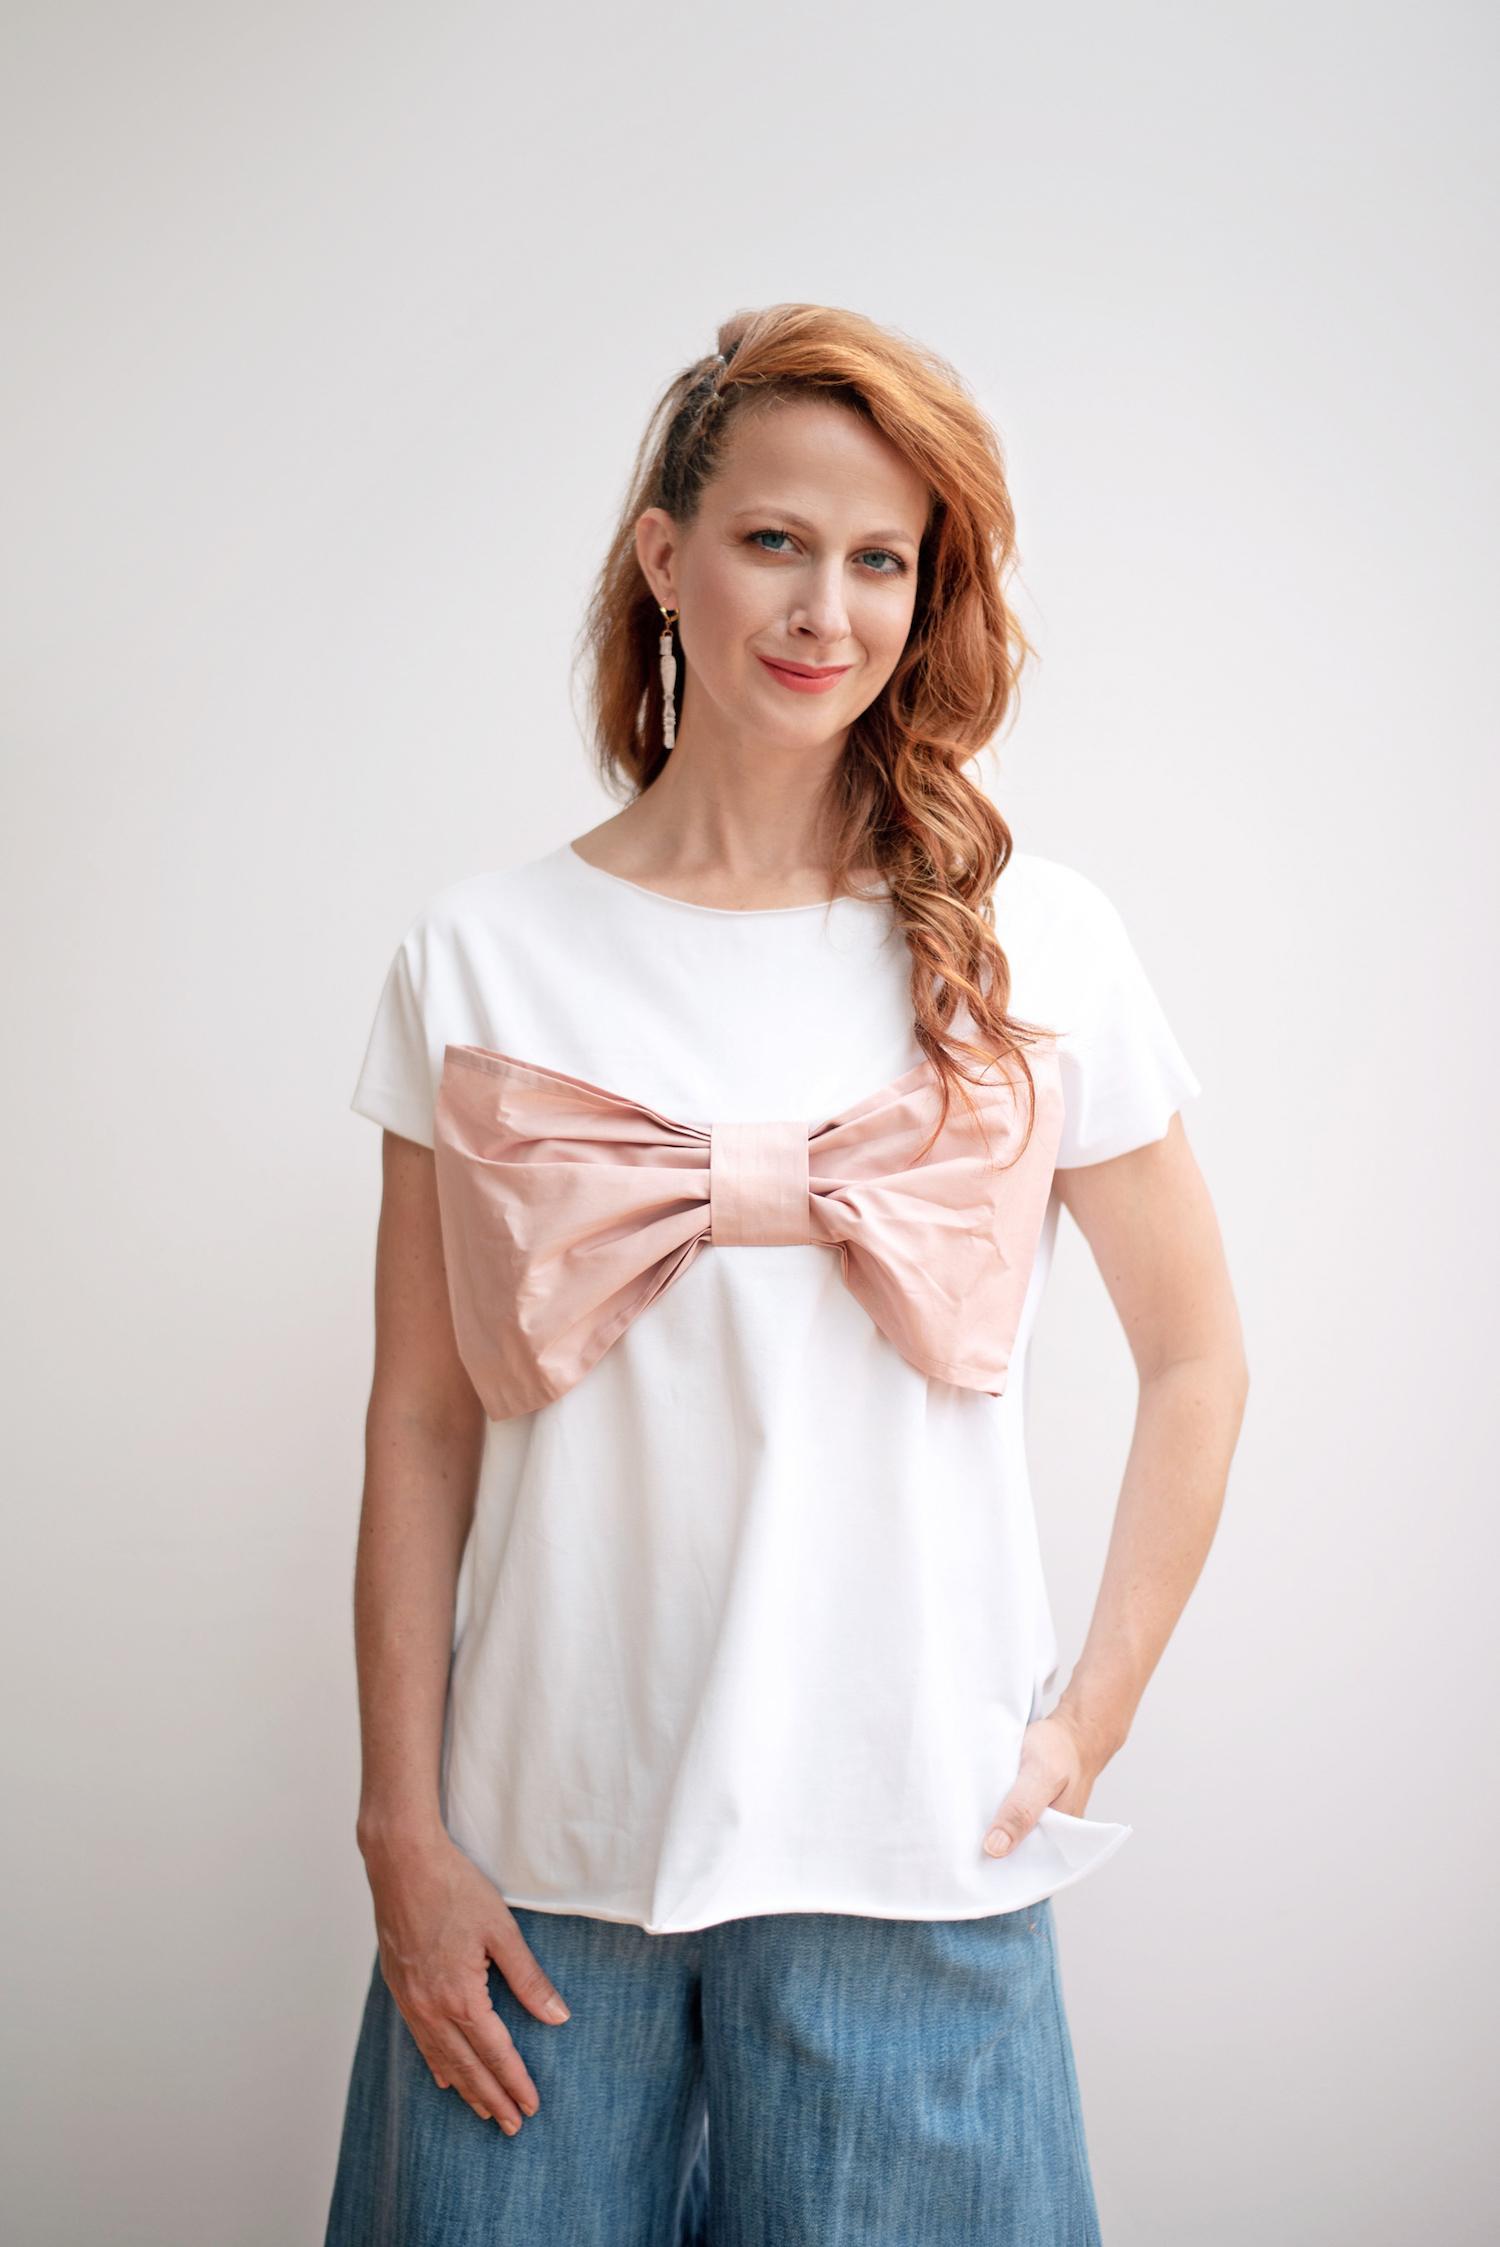 sustainable trajnostno majica eko bombaz eva ahacevcic nika veger modni bloger beautyfullblog